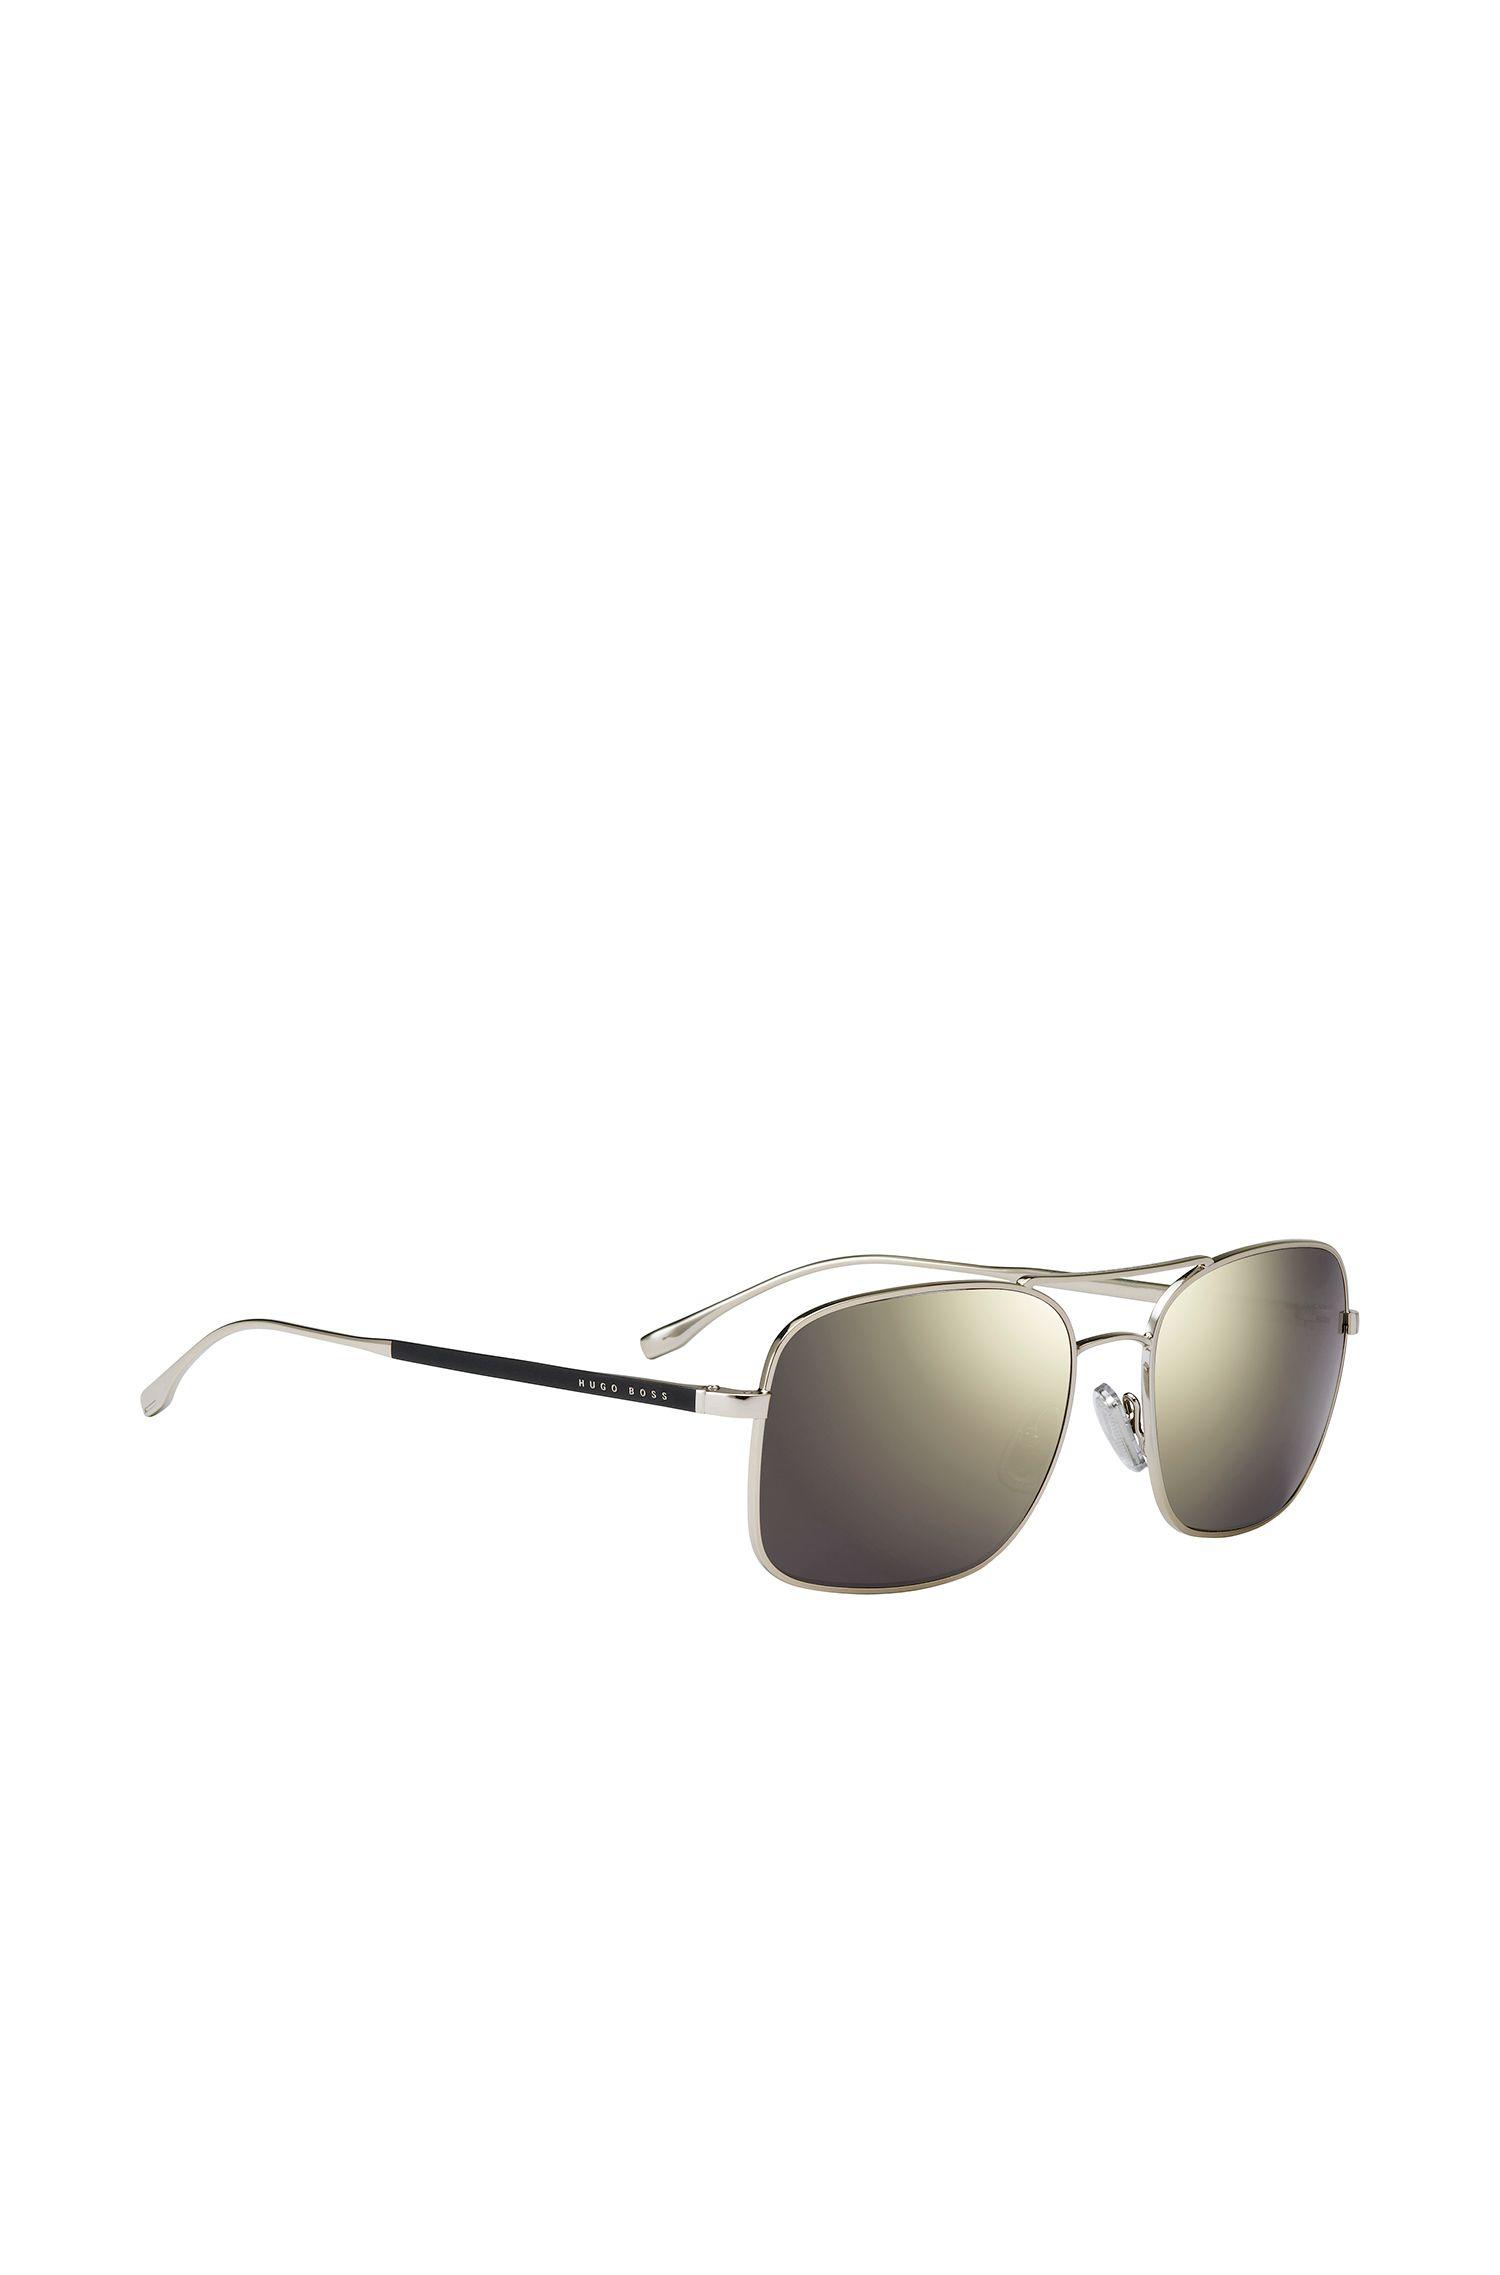 'BOSS 0781S'   Gunmetal Lens Caravan Sunglasses